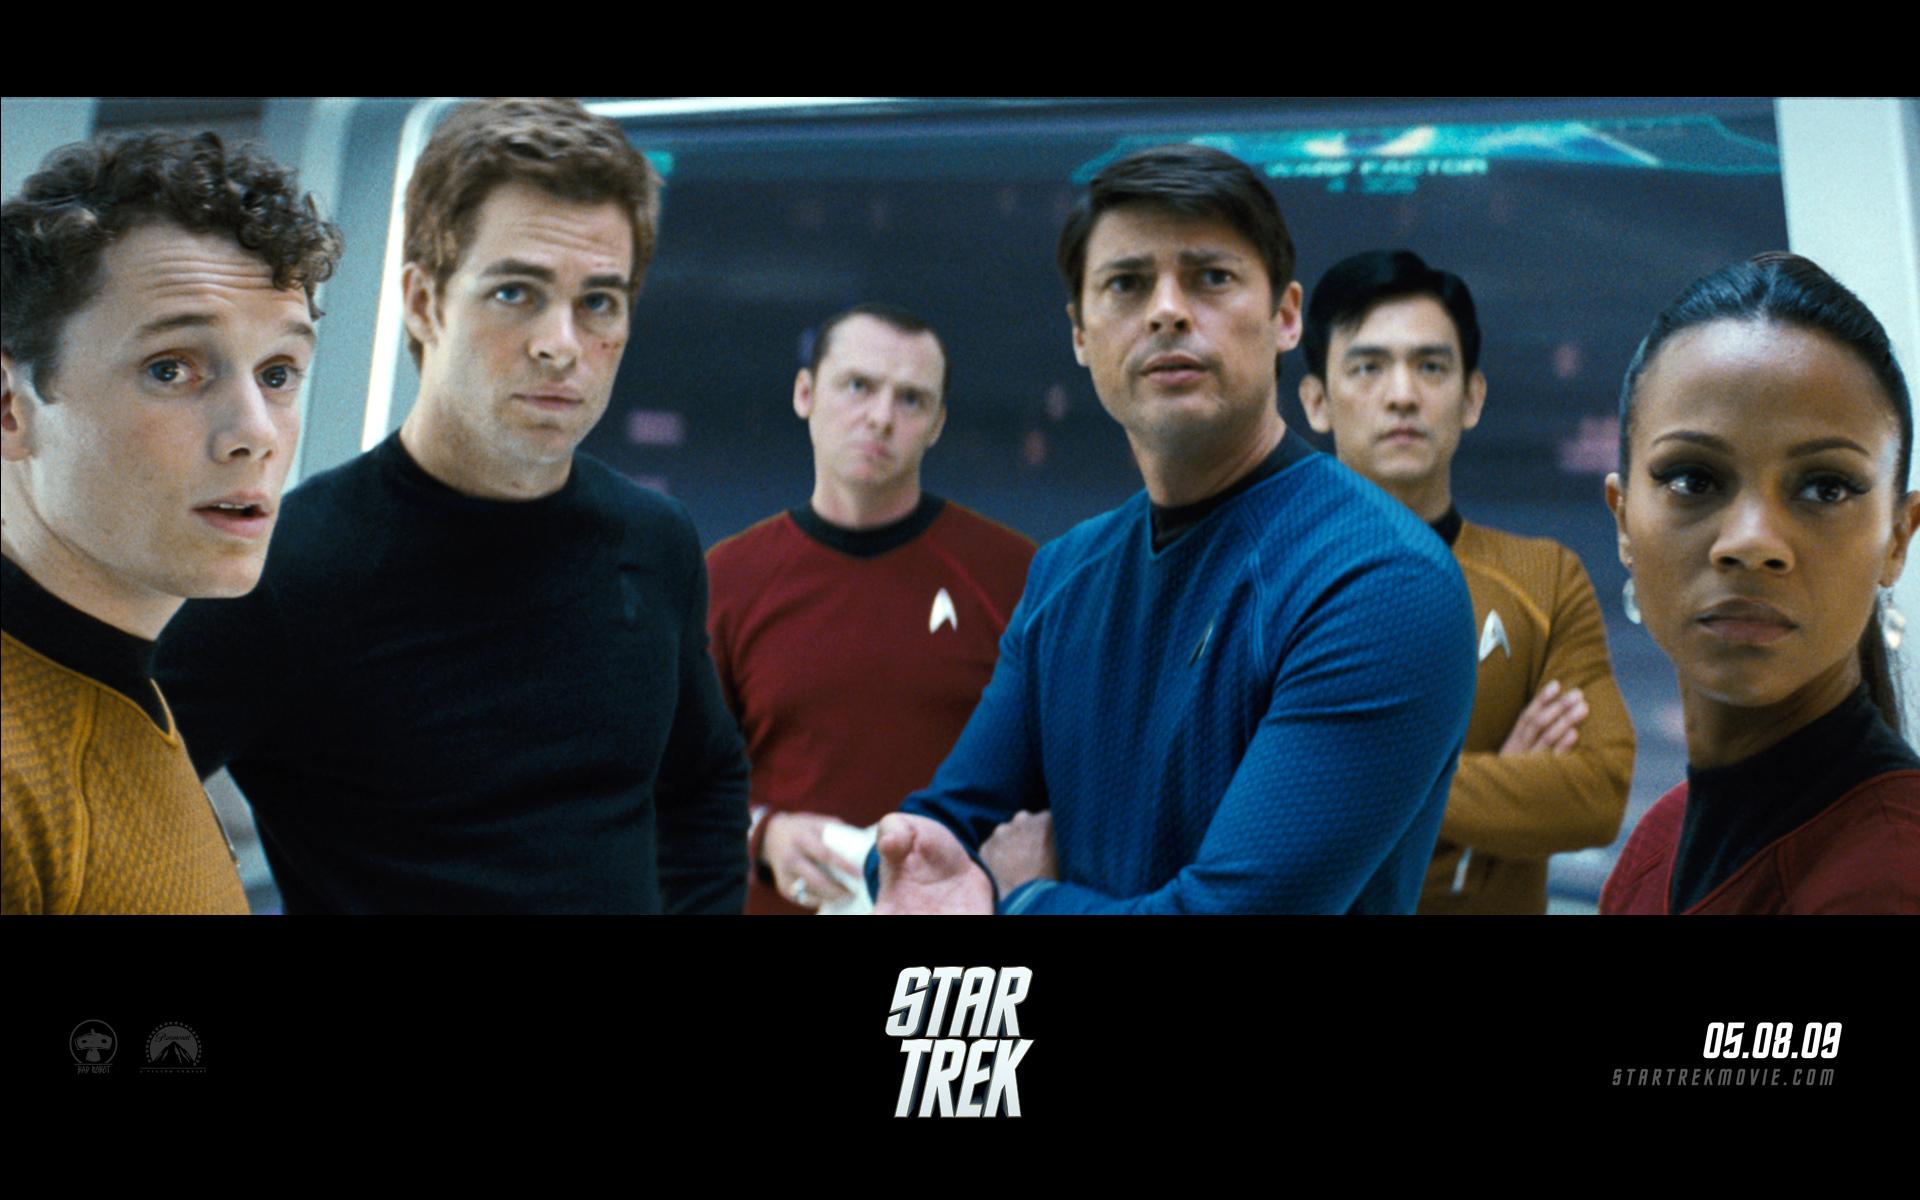 Star Trek Official Wallpapers